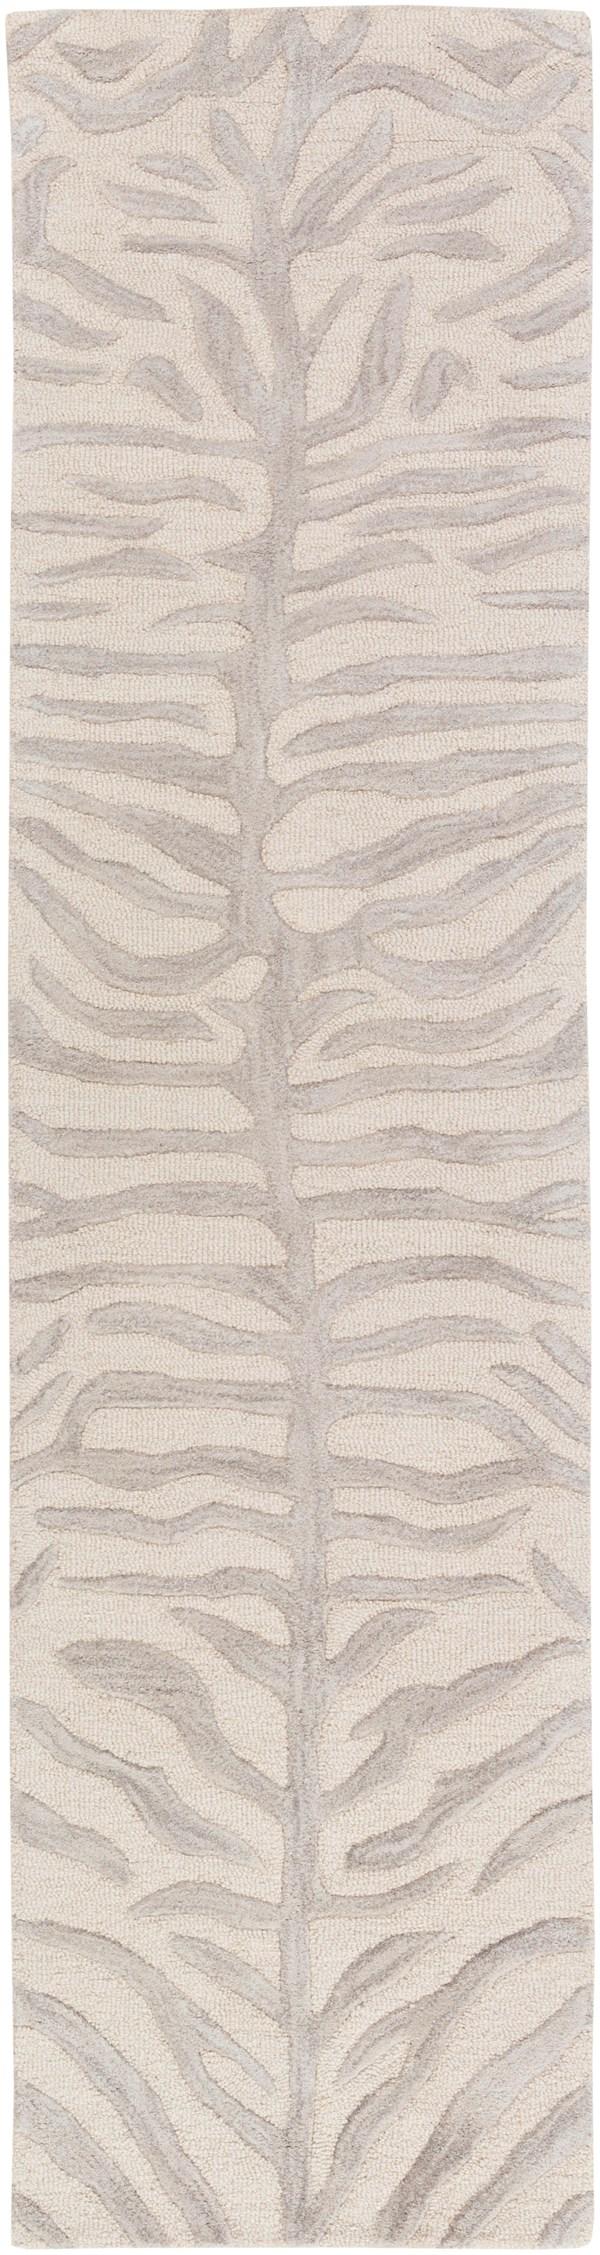 Light Grey, Beige (AWPL-2232) Animals / Animal Skins Area Rug